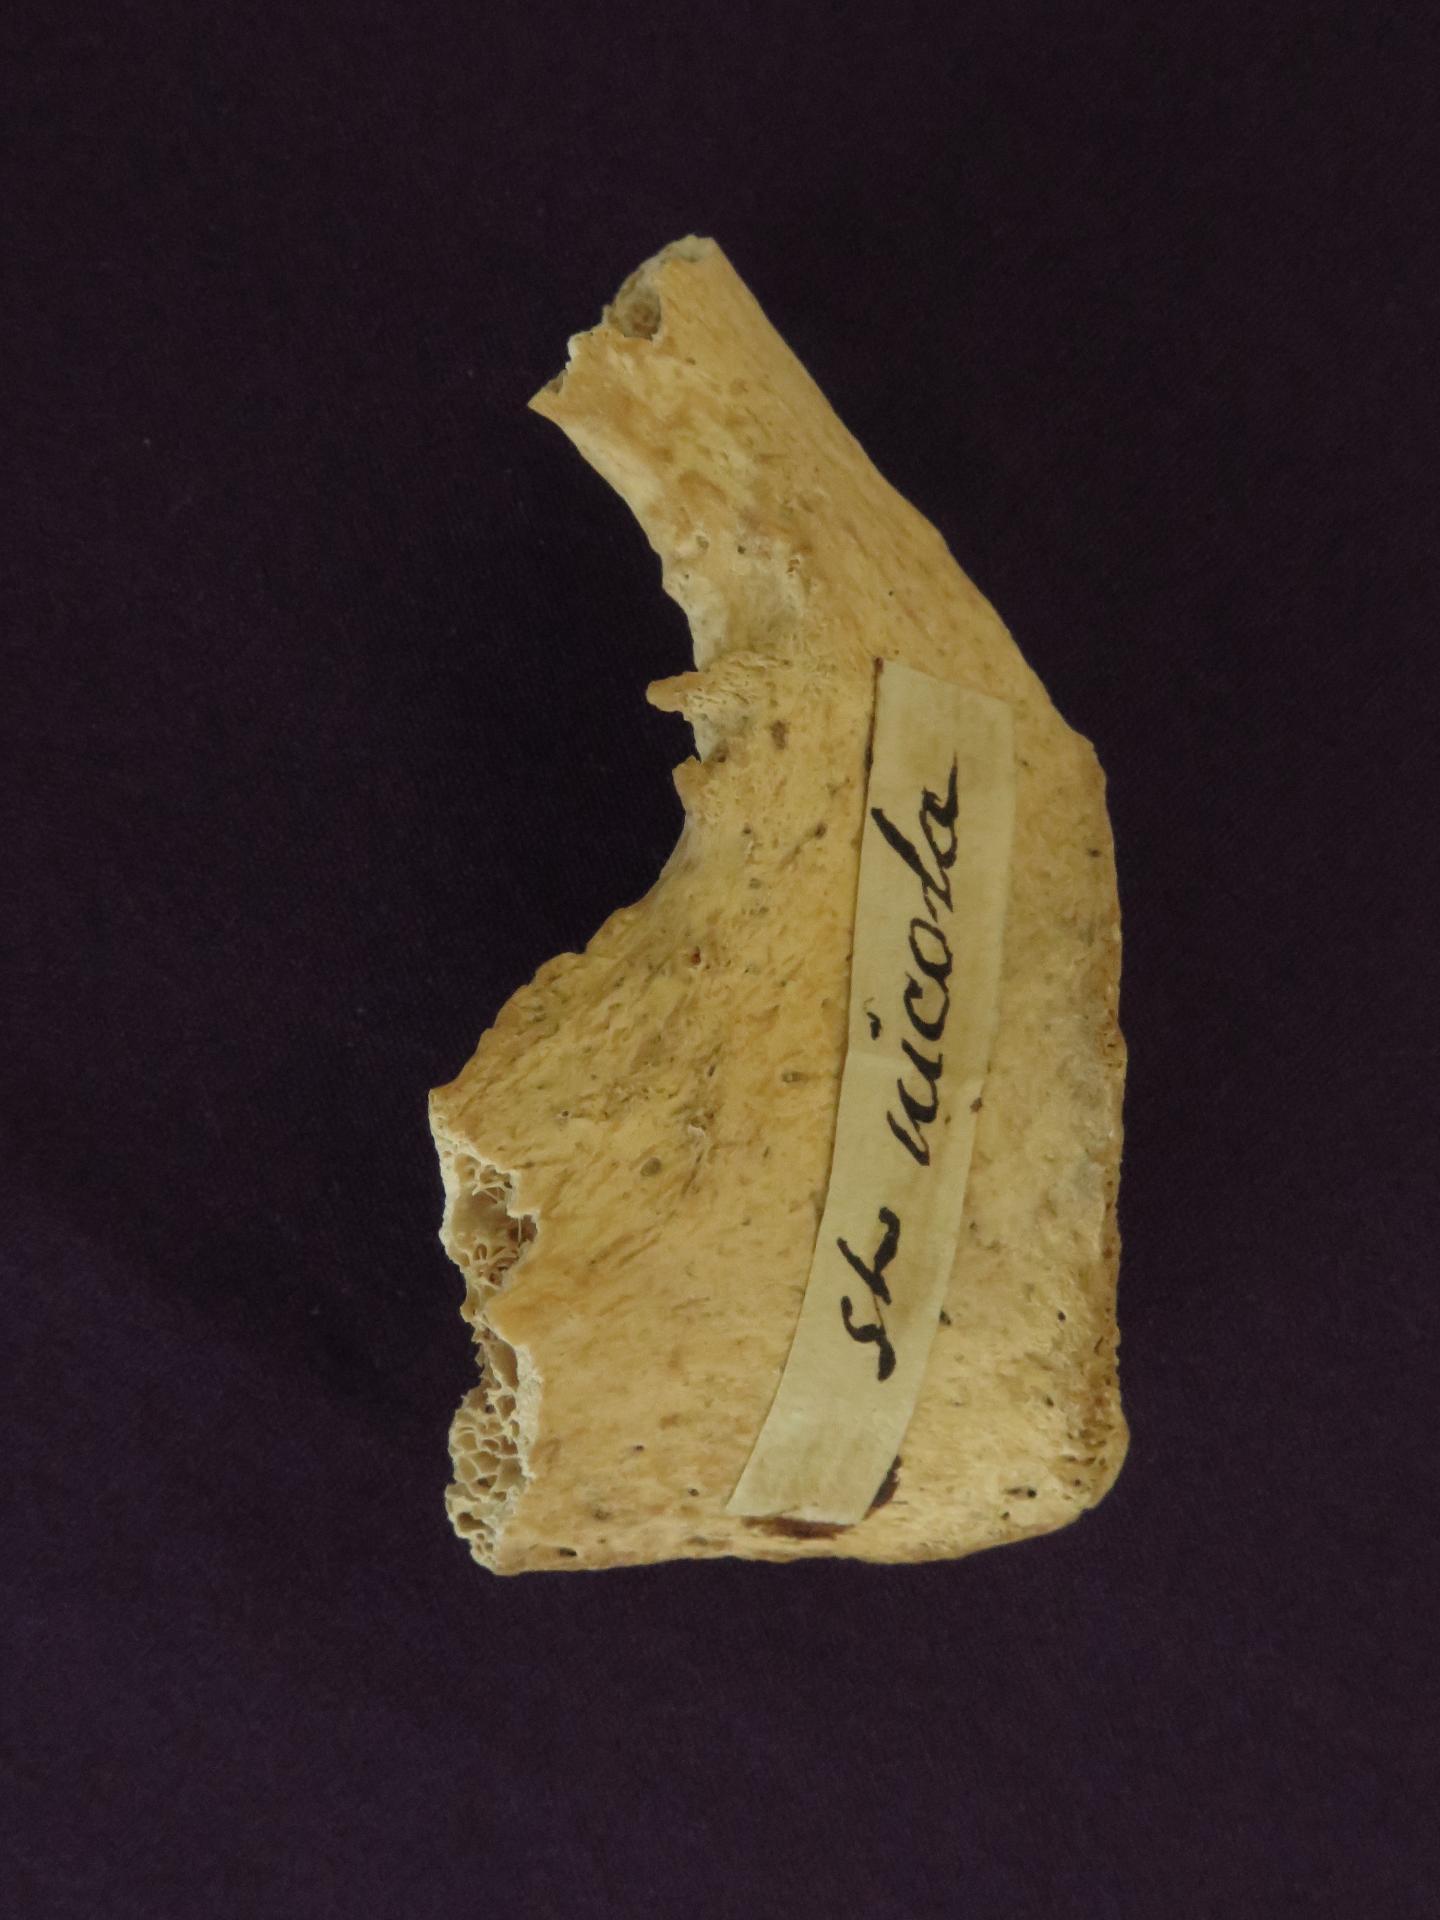 Relic of St. Nicholas (Pelvis Fragment)